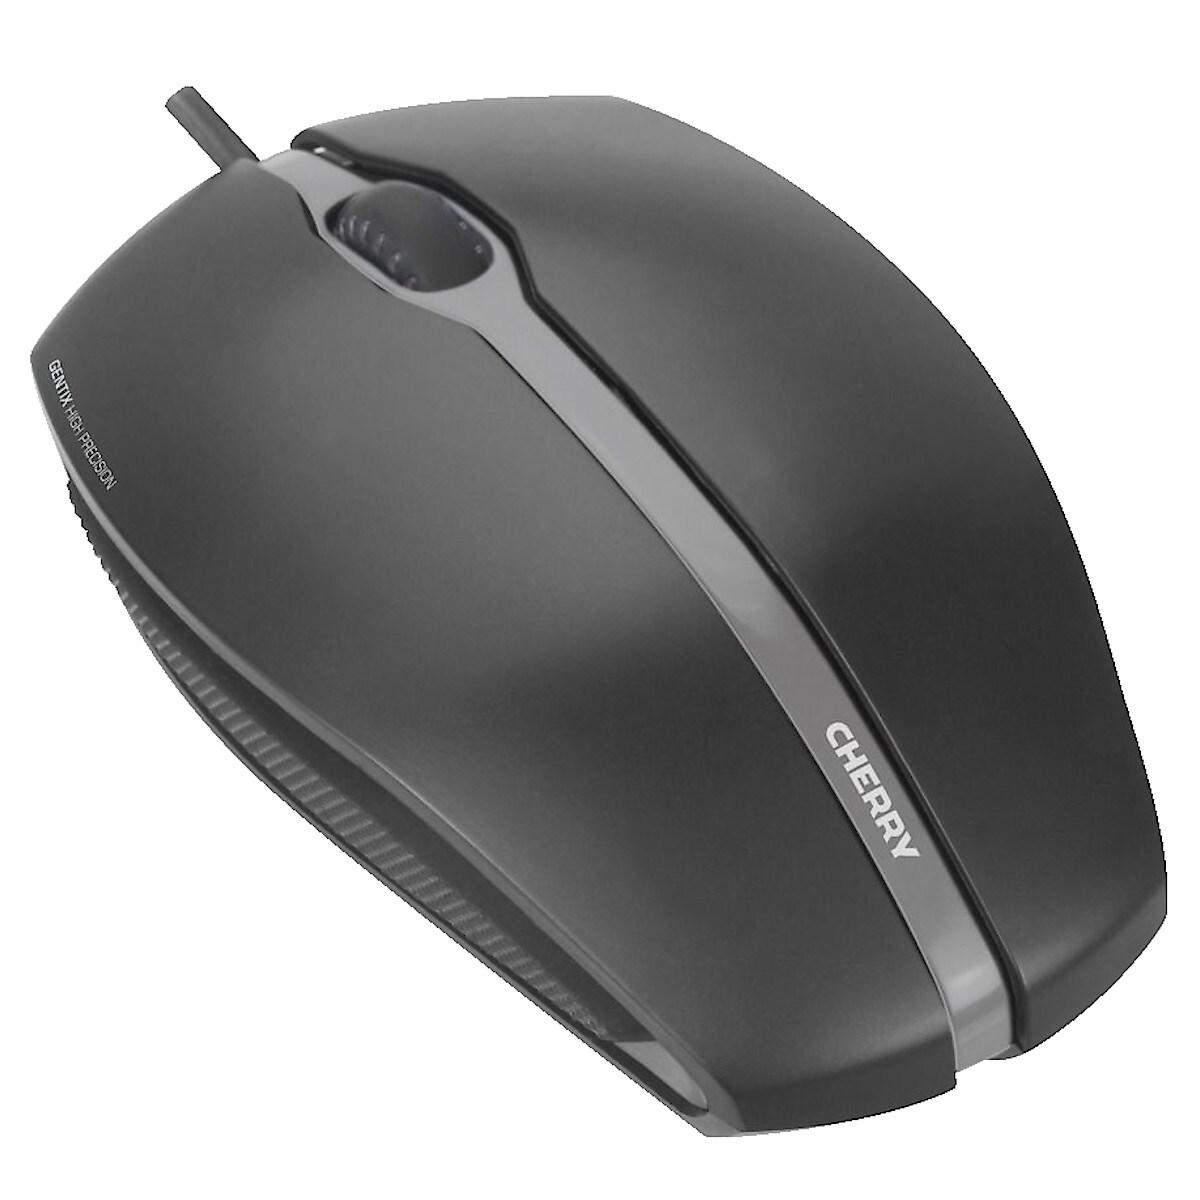 Cherry USB optical mouse